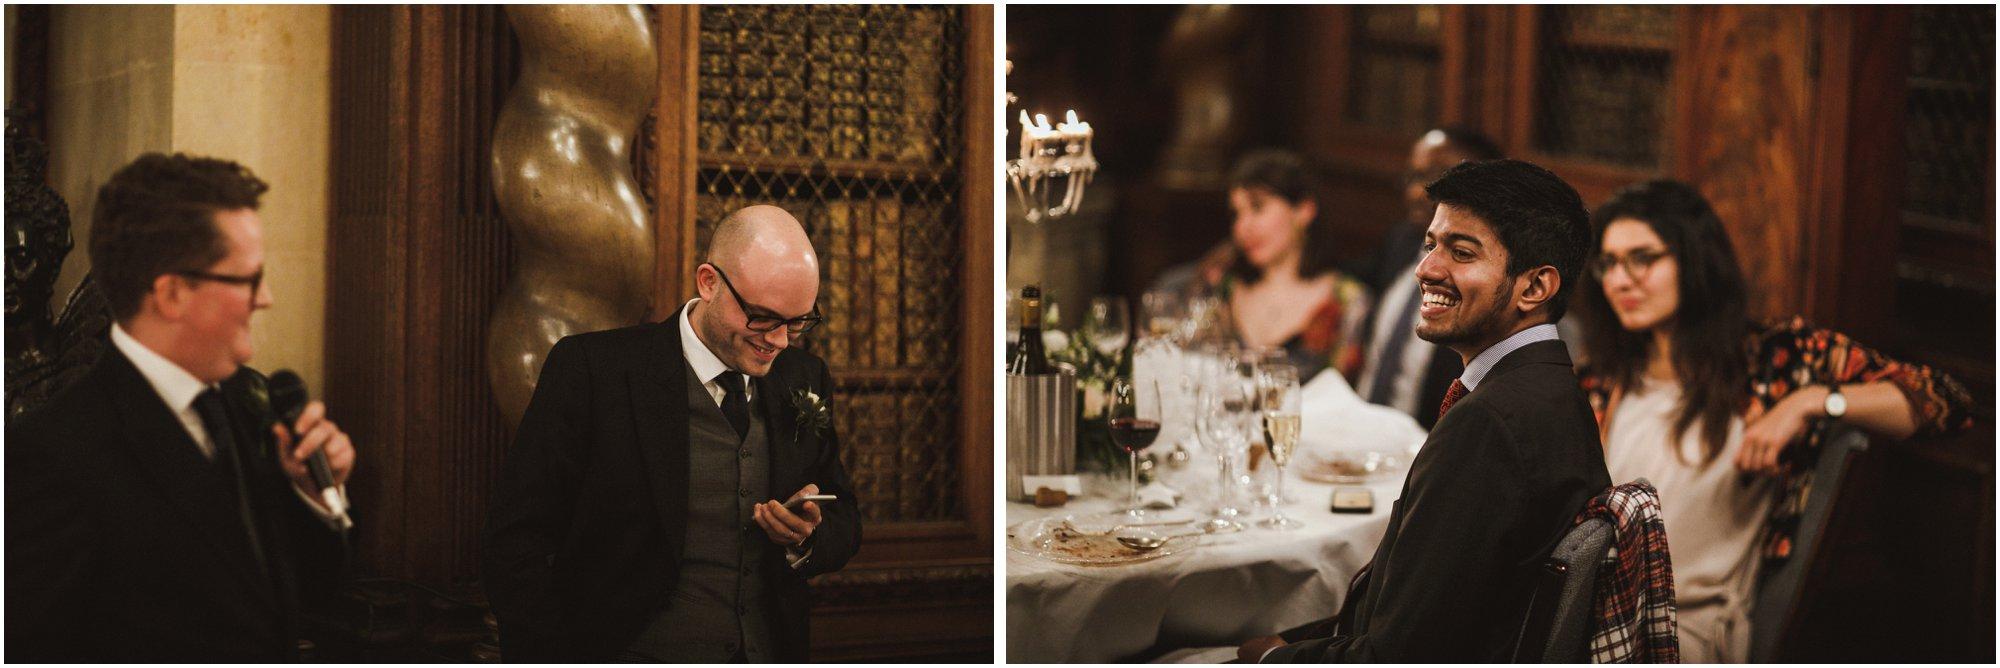 Burghley House Wedding Stamford_0164.jpg